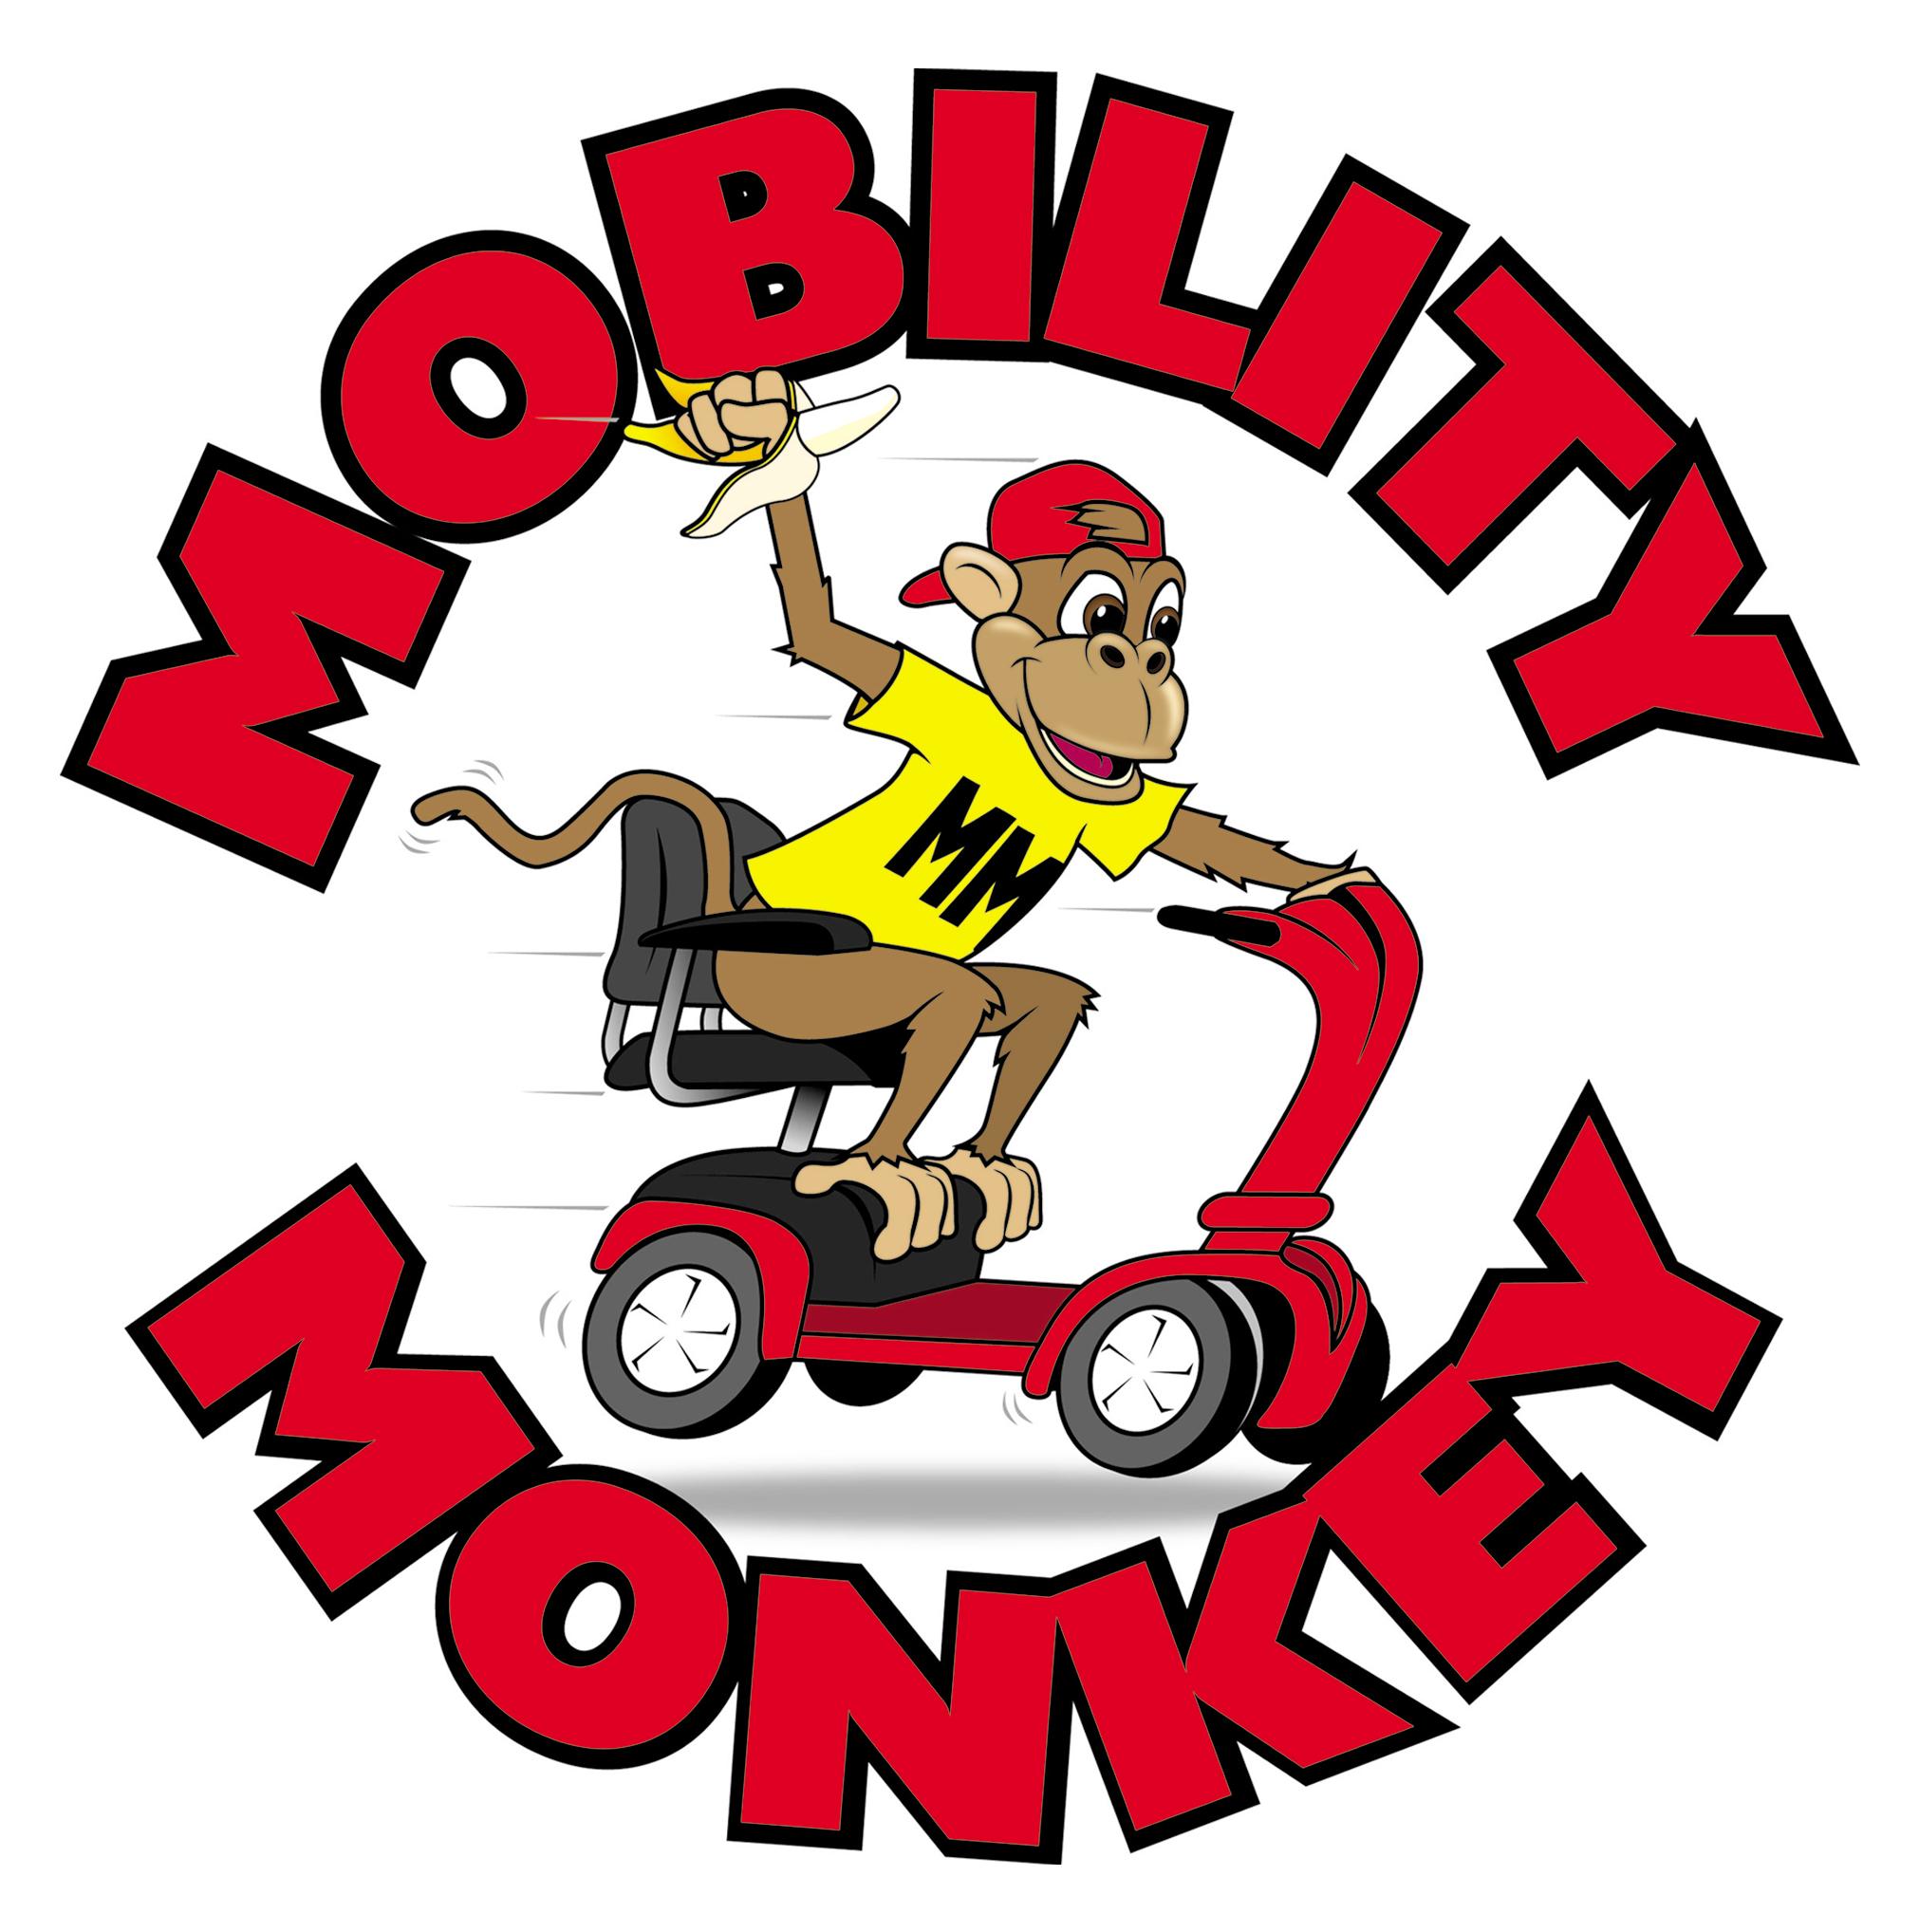 Mobility Monkey